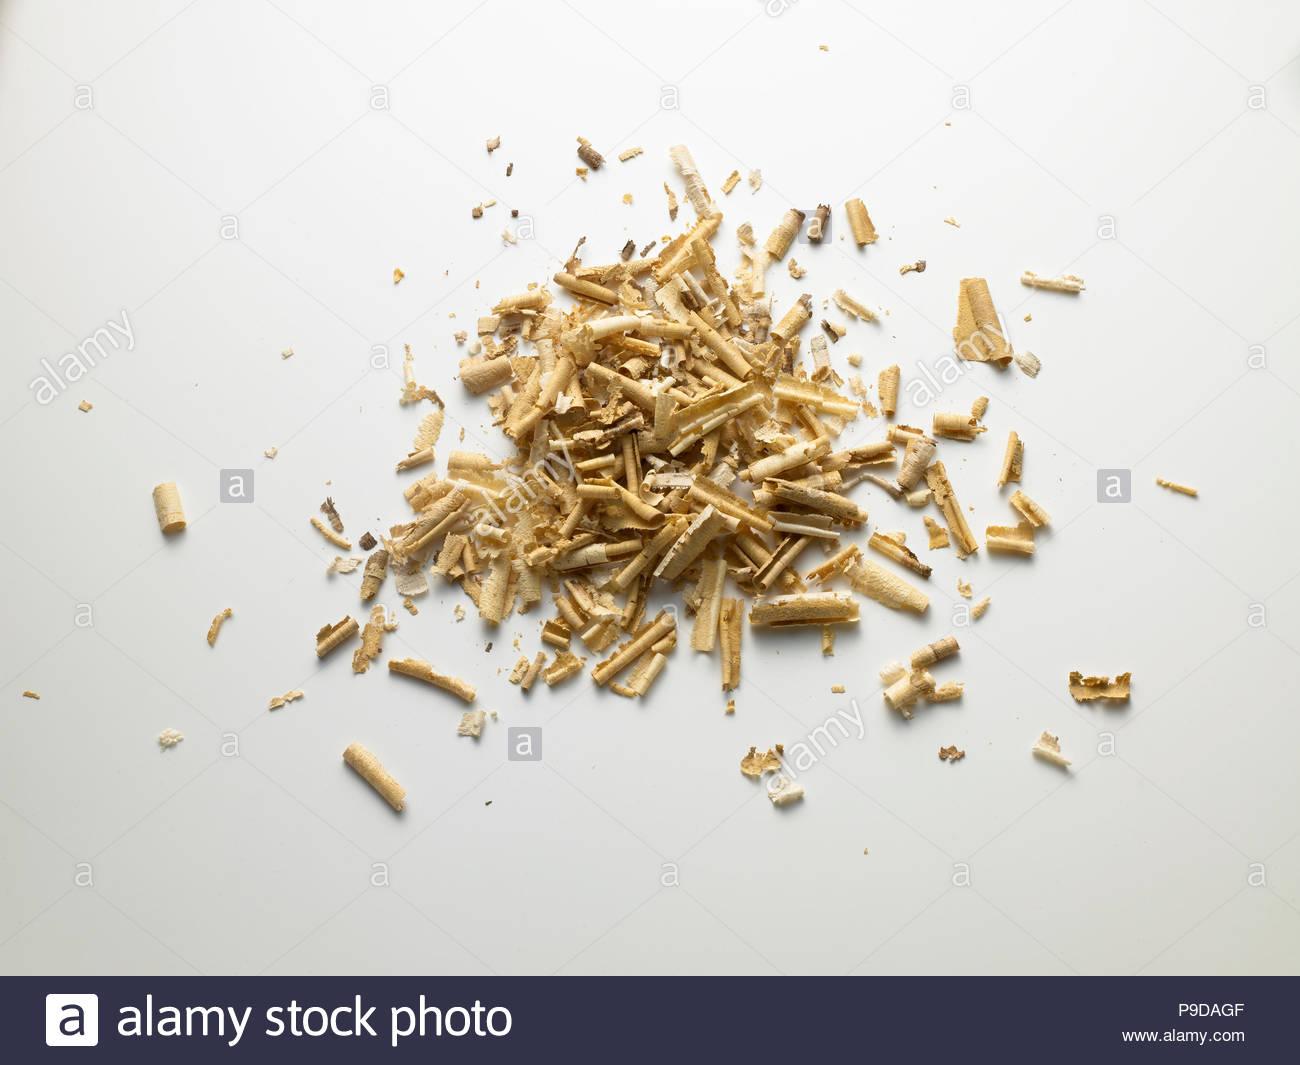 Virutas de madera sobre fondos blancos Imagen De Stock